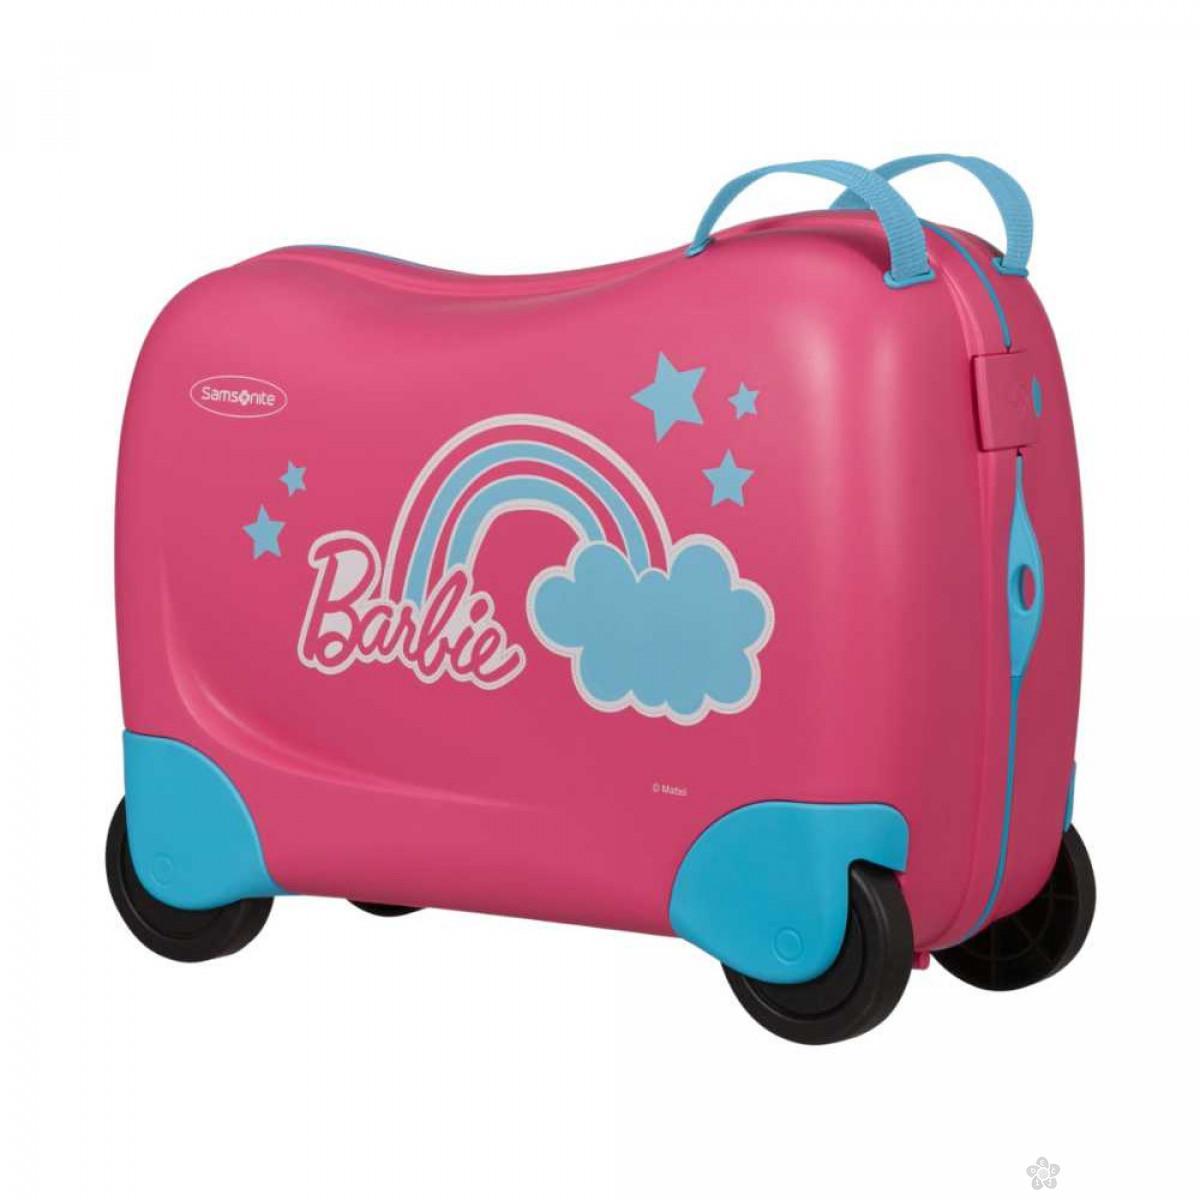 Samsonite kofer Barbie 90C*90001